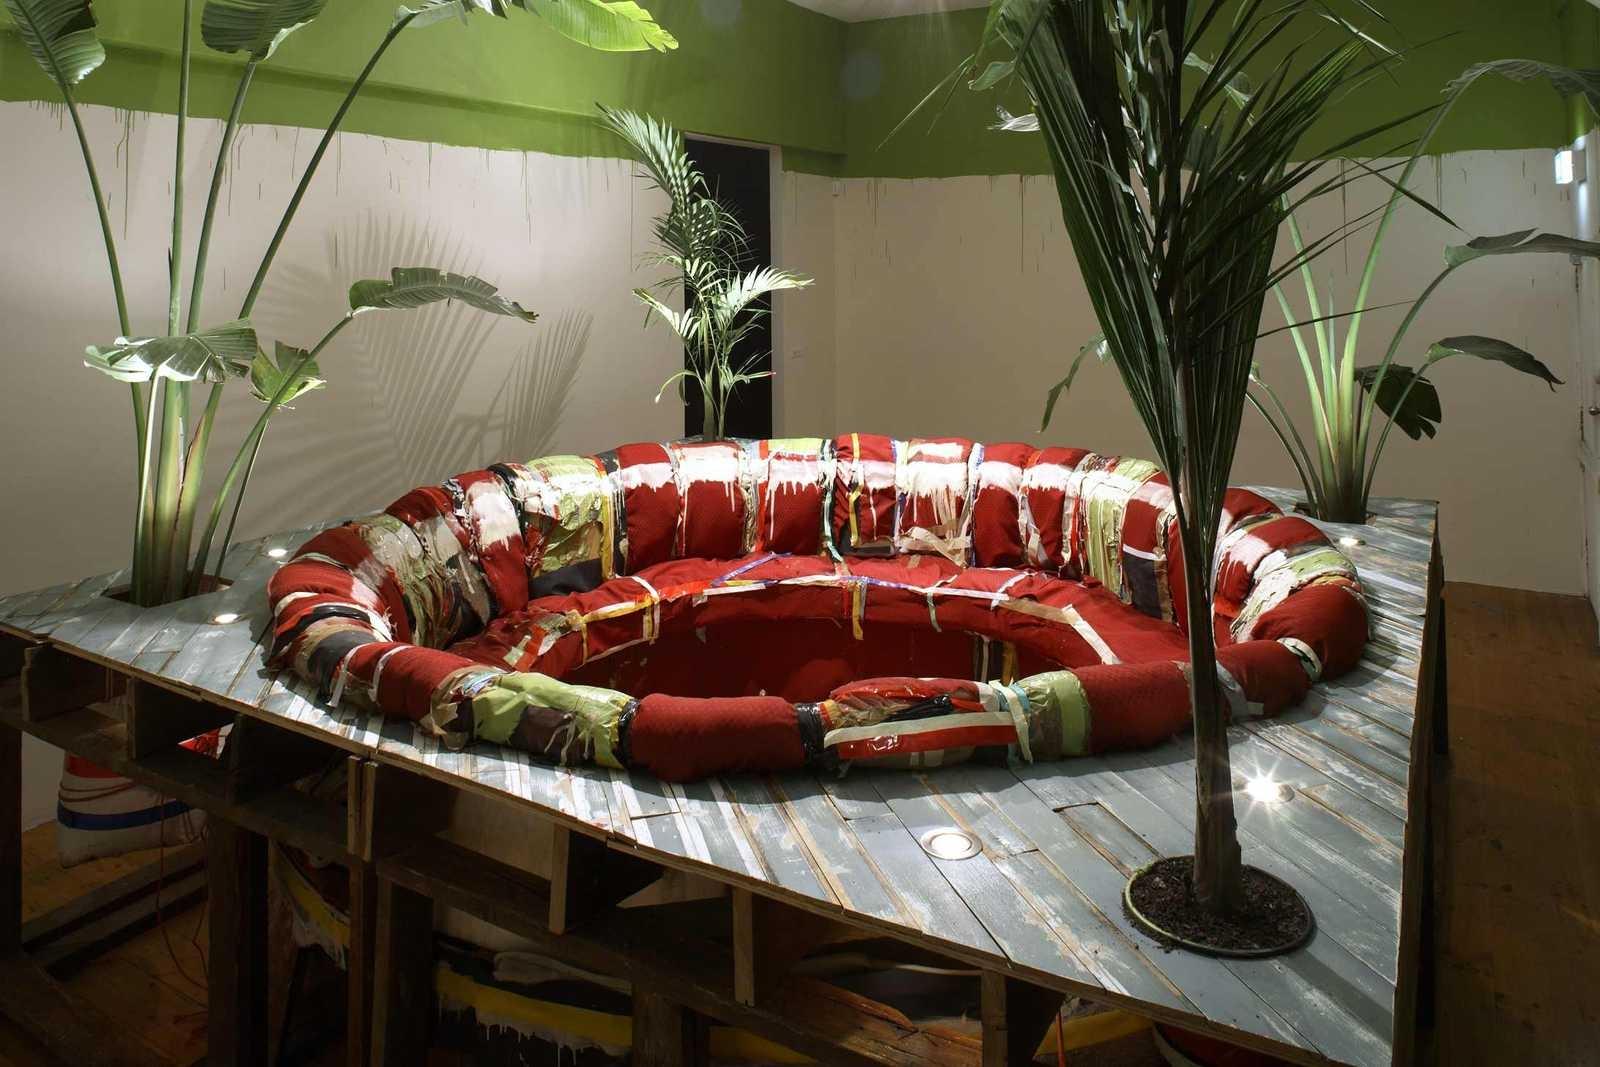 Un-Sunken Lounge image